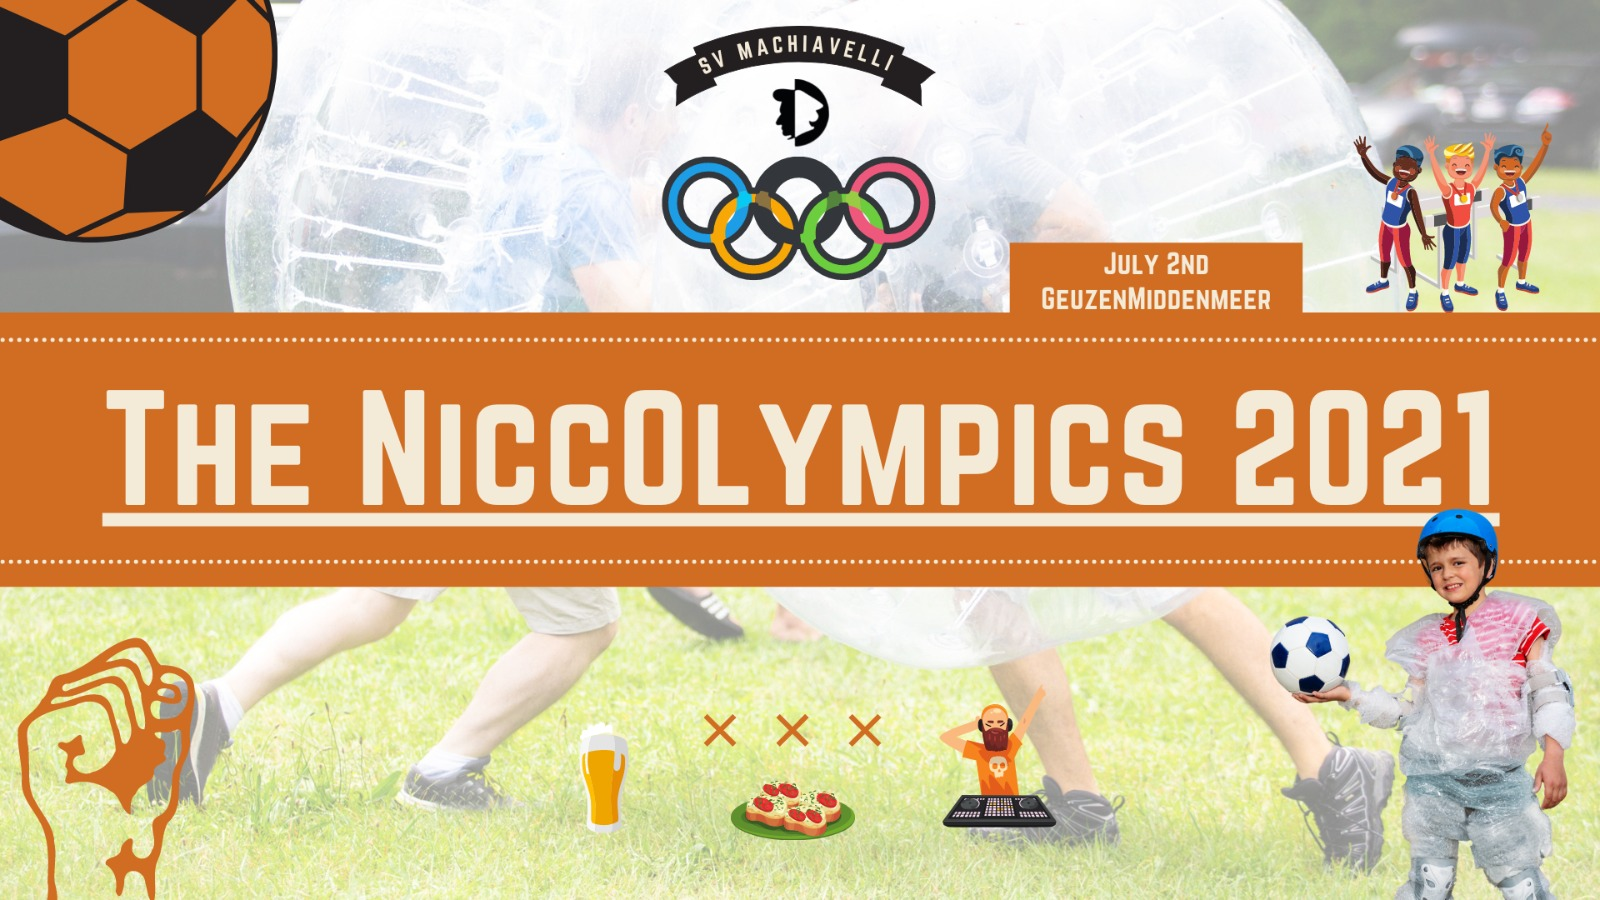 The NiccOlympics 2021